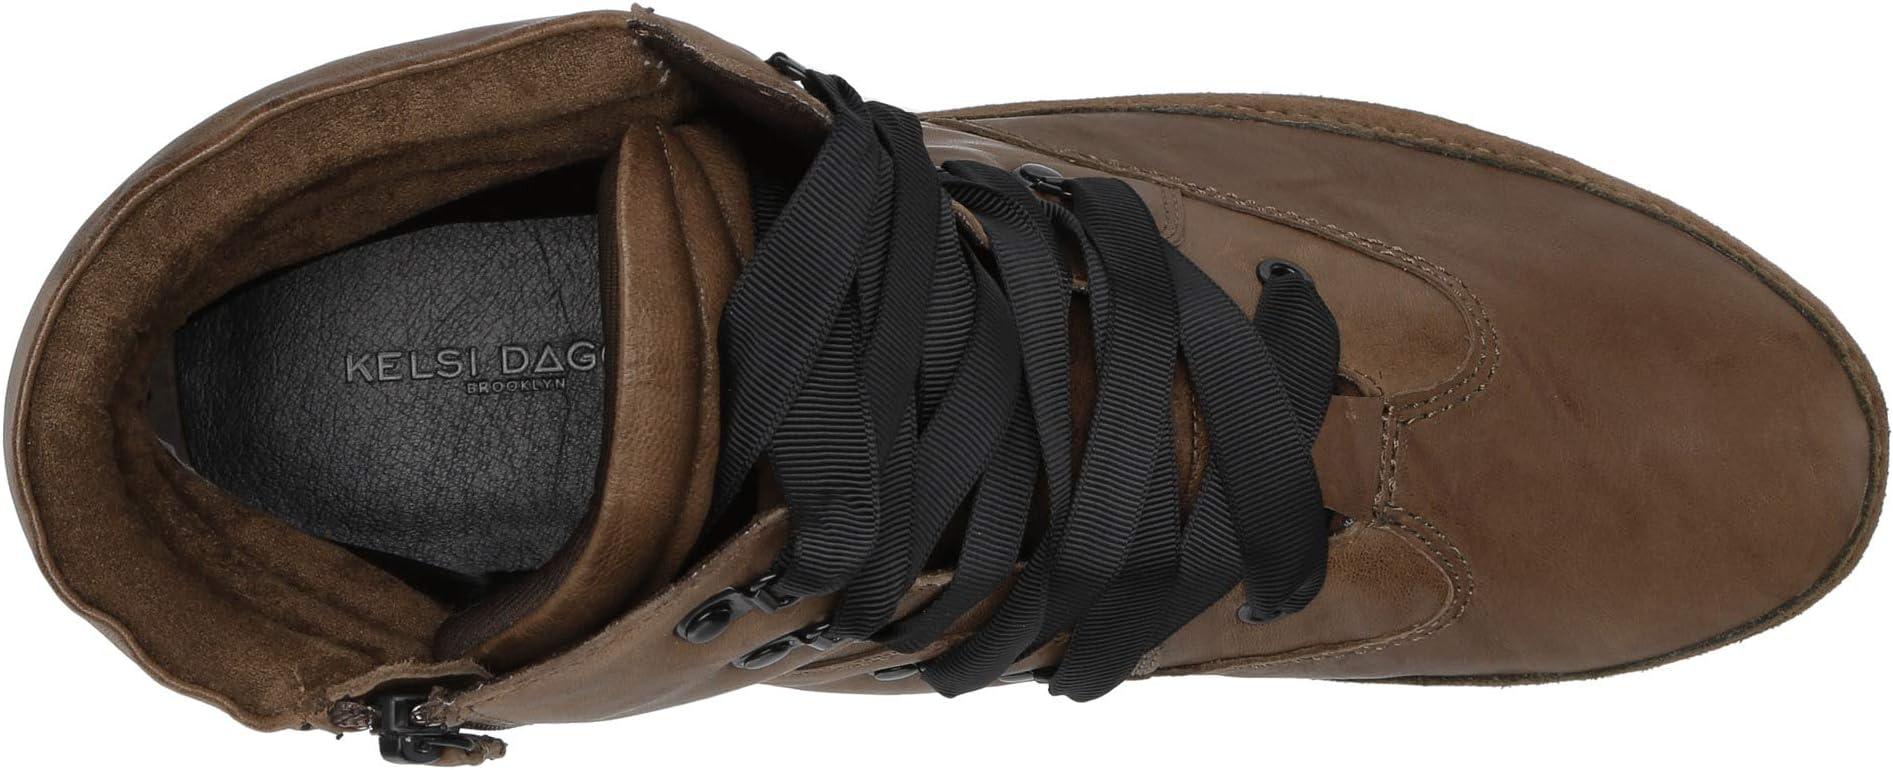 Kelsi Dagger Brooklyn Mari | Women's shoes | 2020 Newest